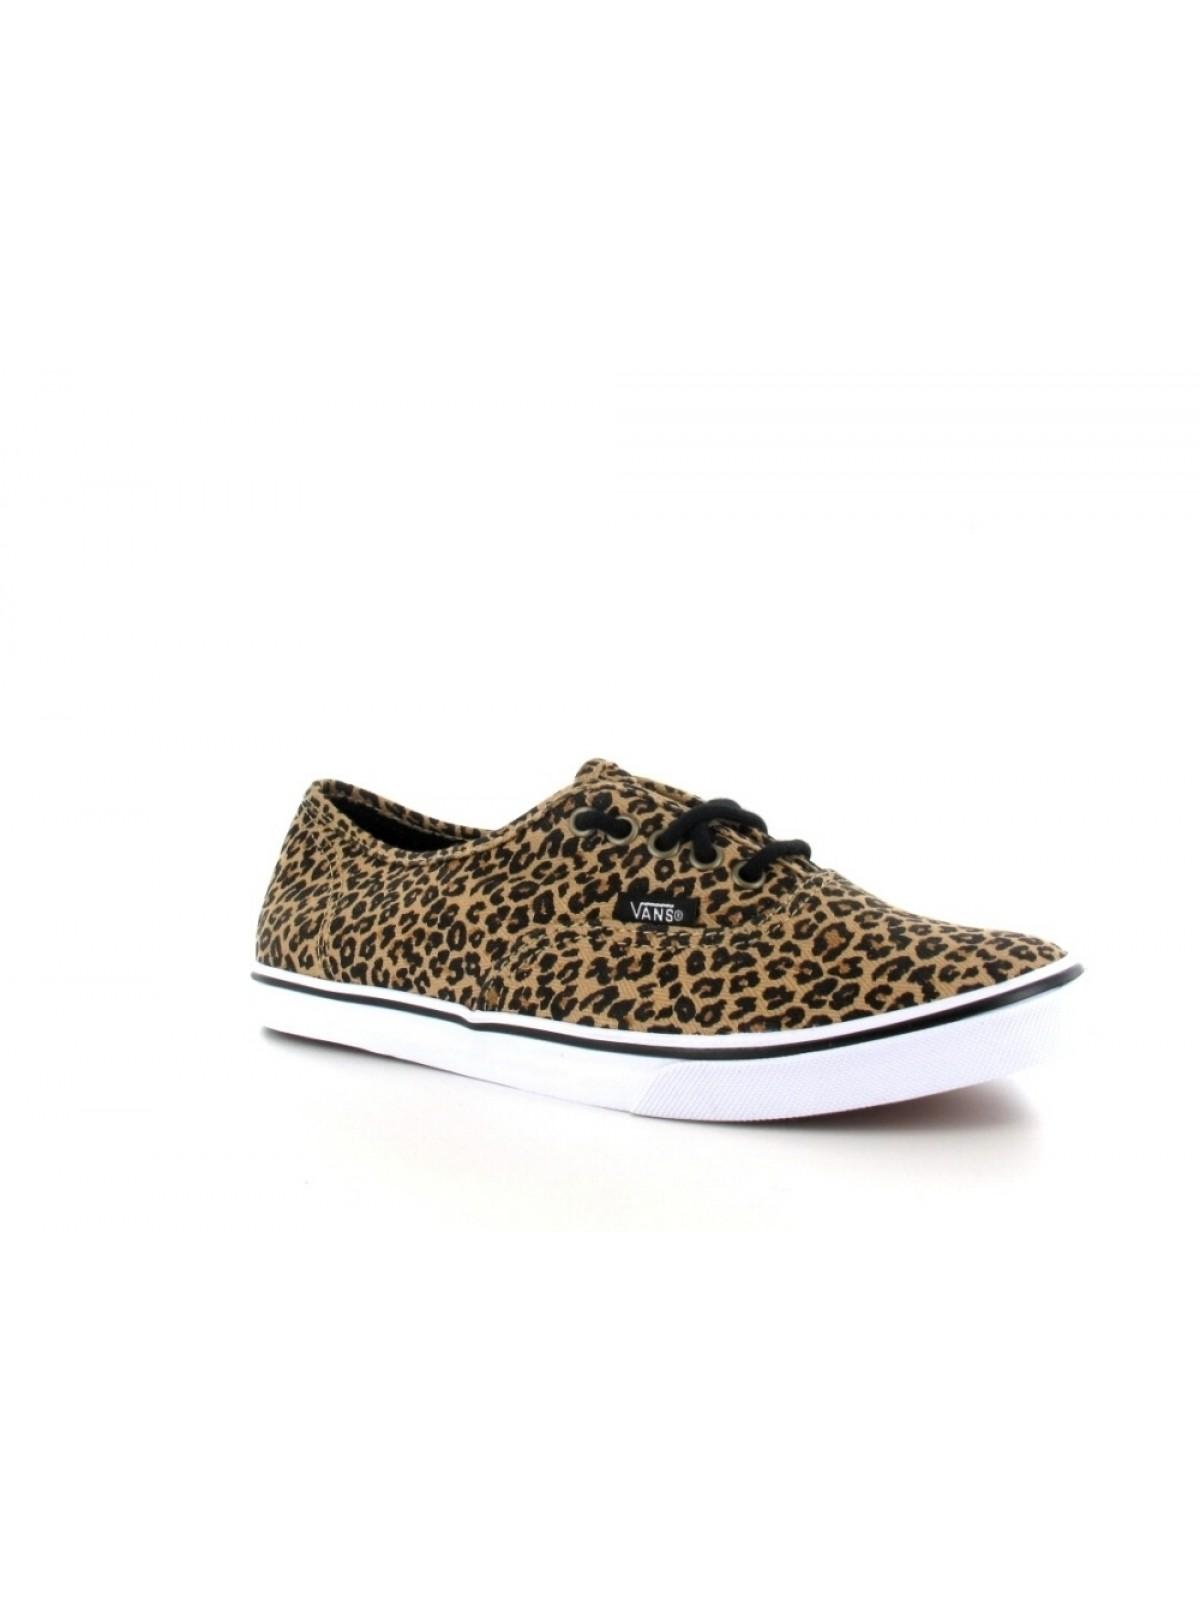 Vans Z Lopro toile leopard